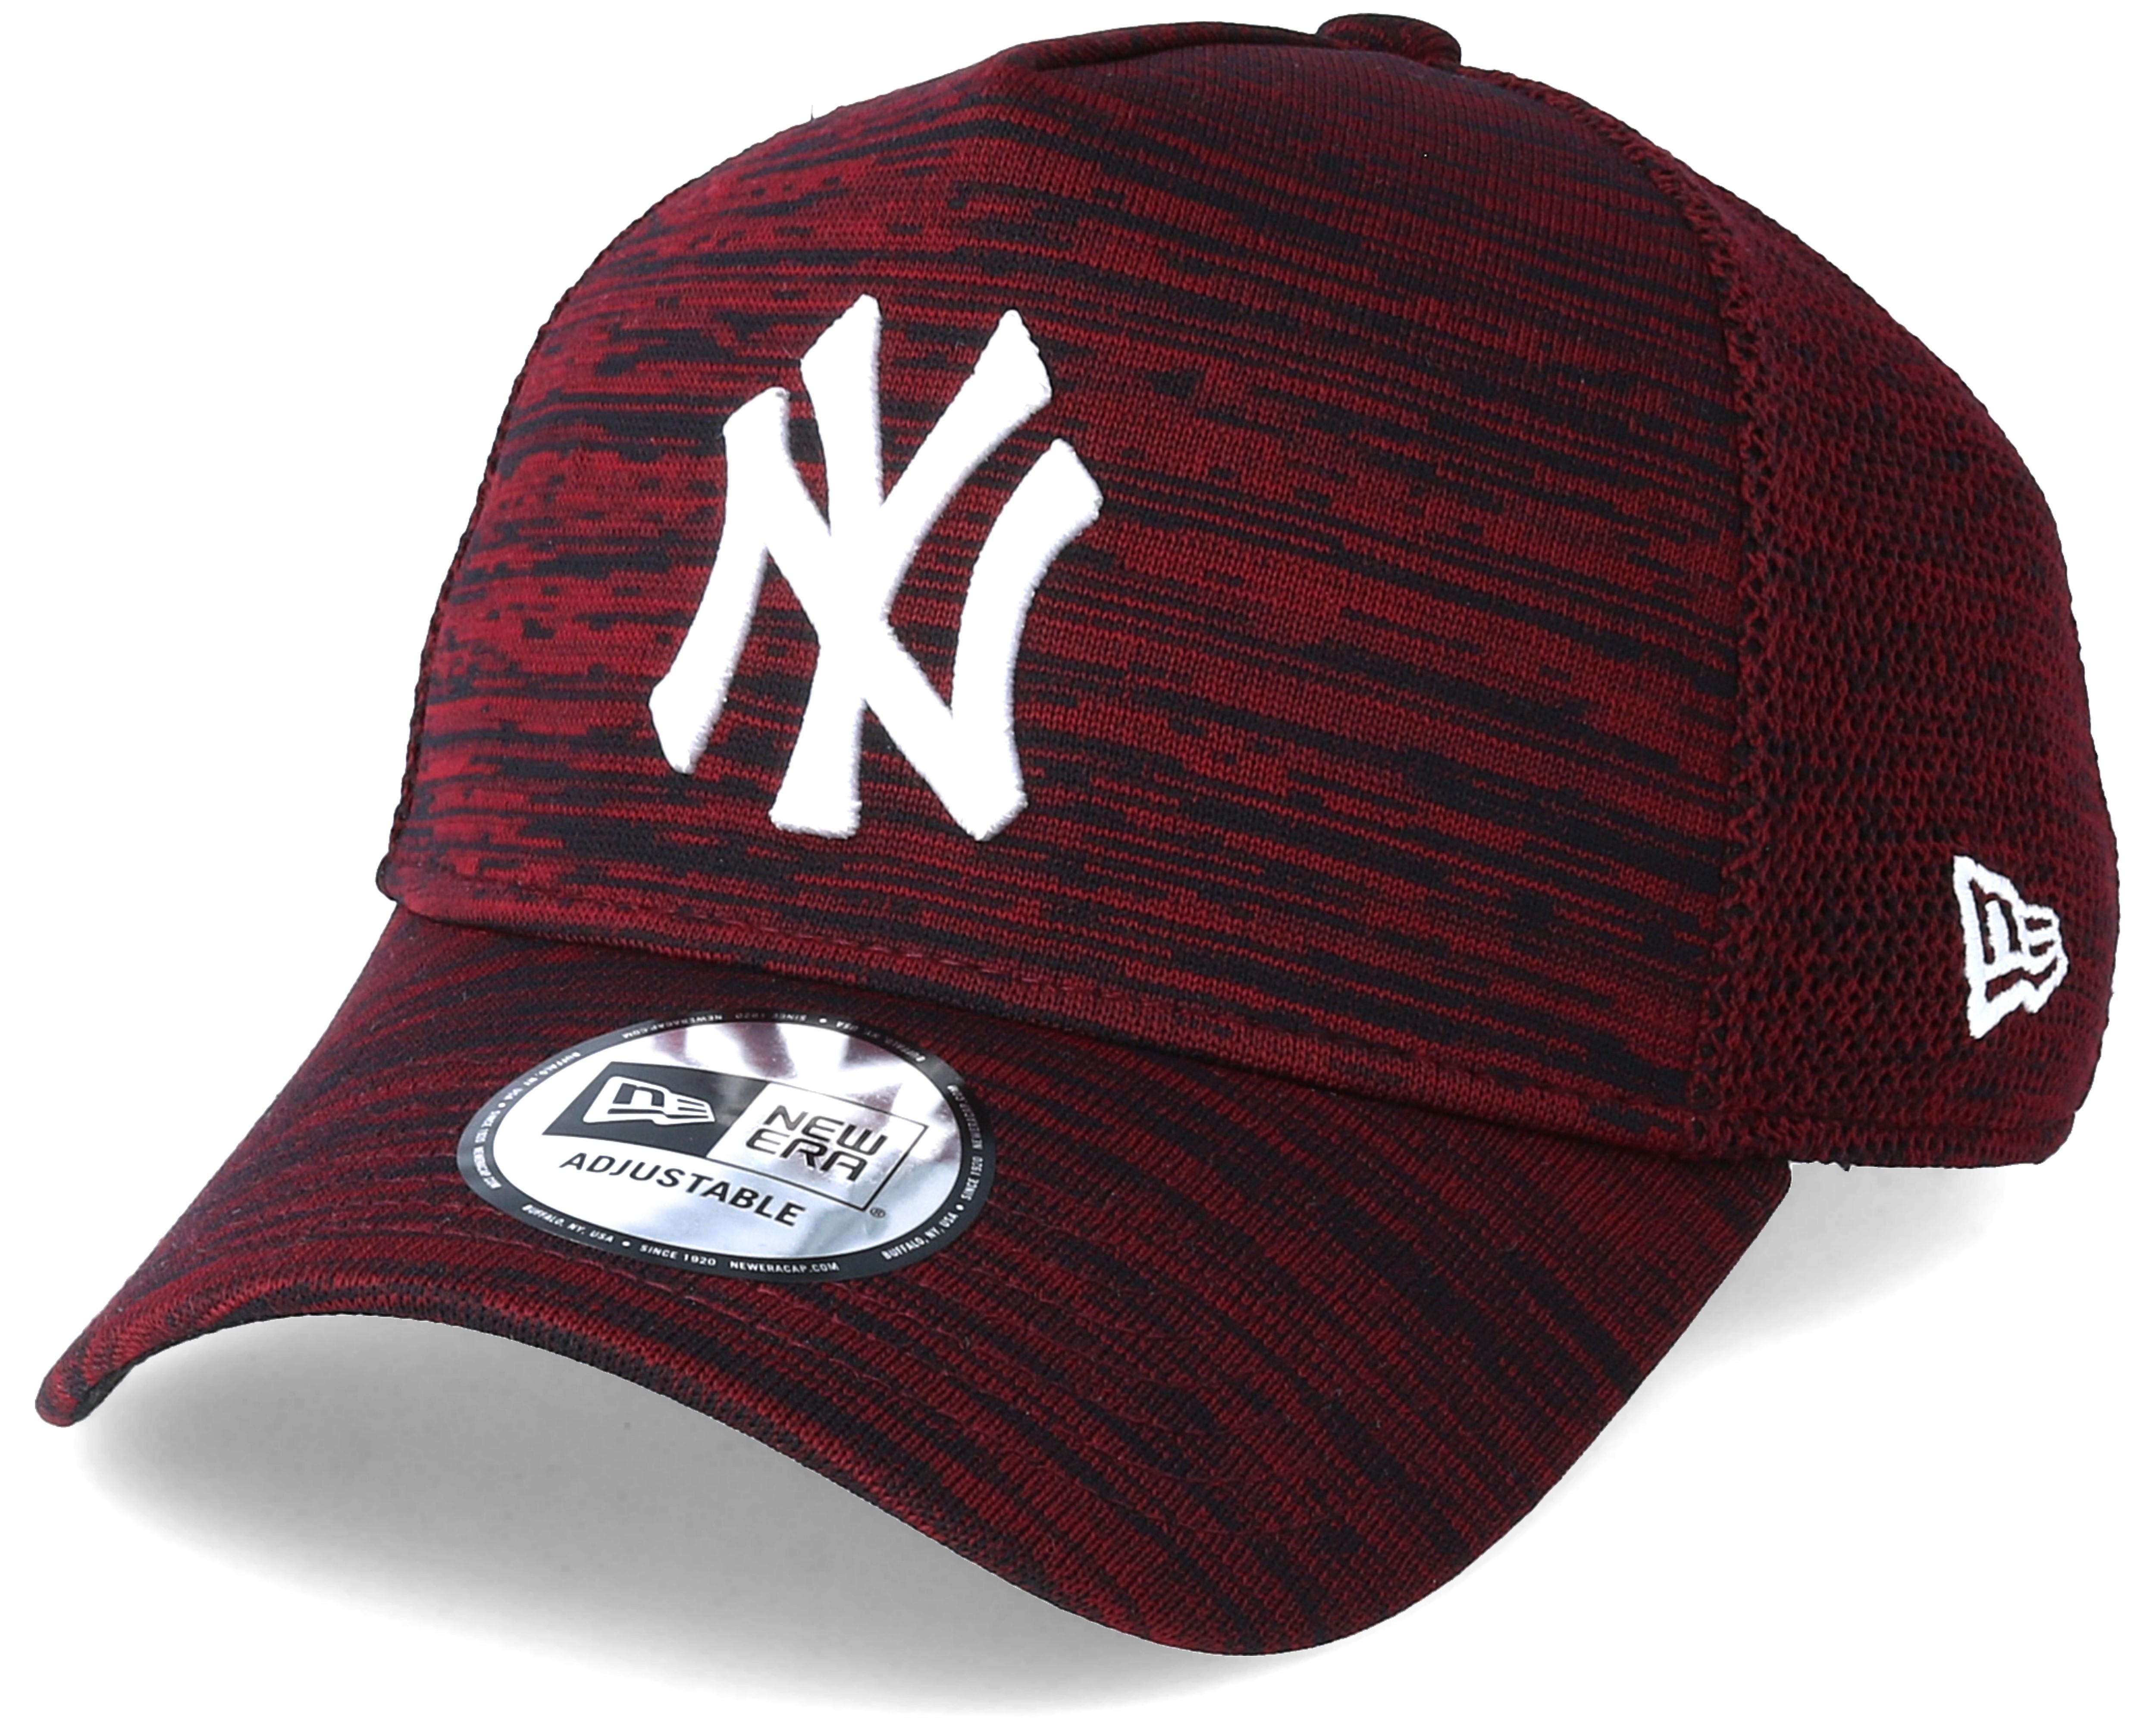 new york yankees aframe engineered fit red adjustable new era cap. Black Bedroom Furniture Sets. Home Design Ideas